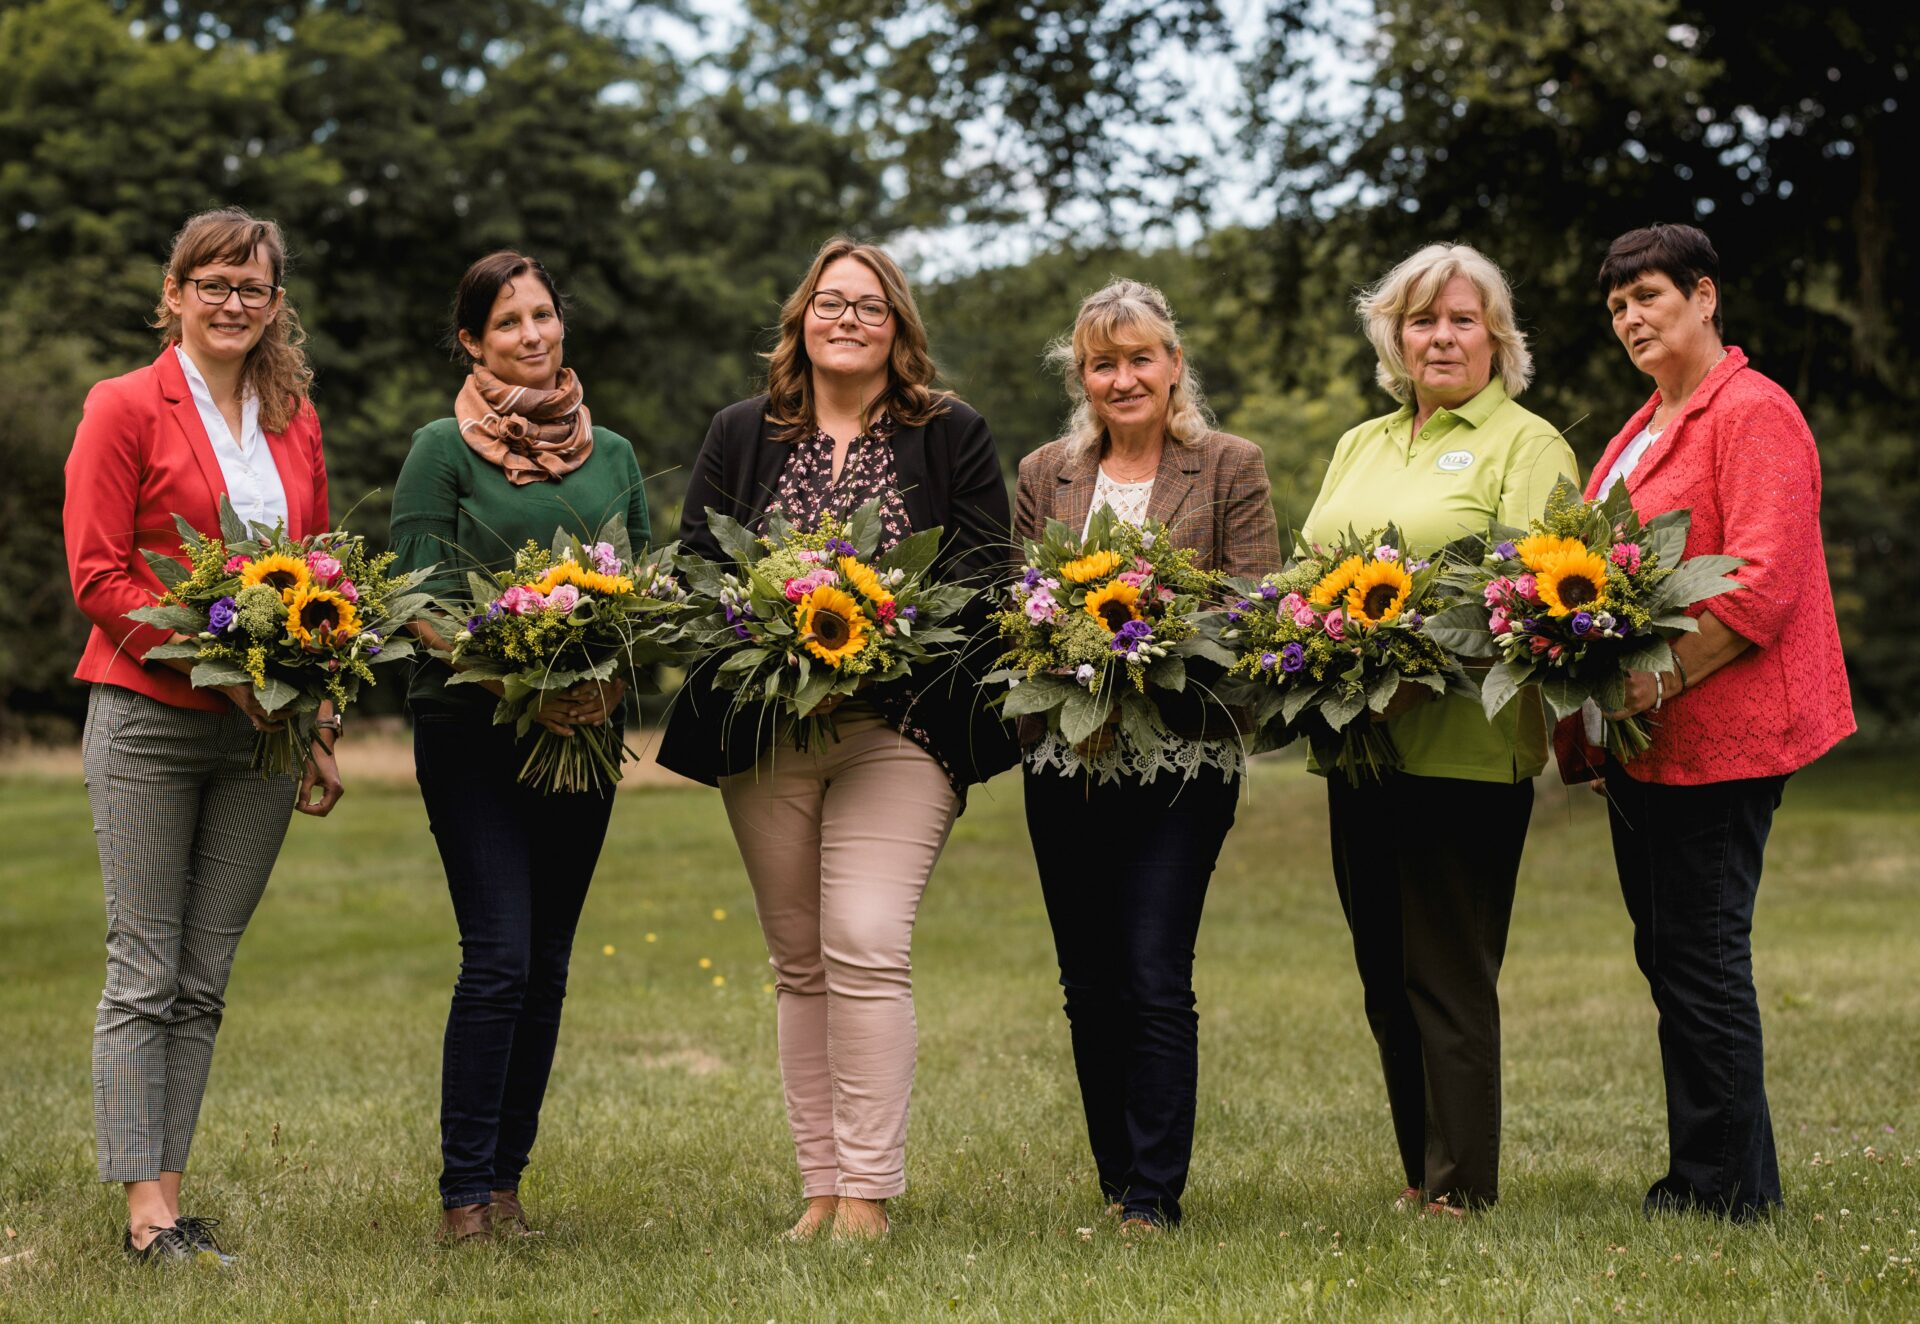 v.l.n.r. Hanka Mittelstädt, Katja Liebenthal, Antje Schulze, Manuela Scheil, Sylvia Herrmann, Ulrike Weller